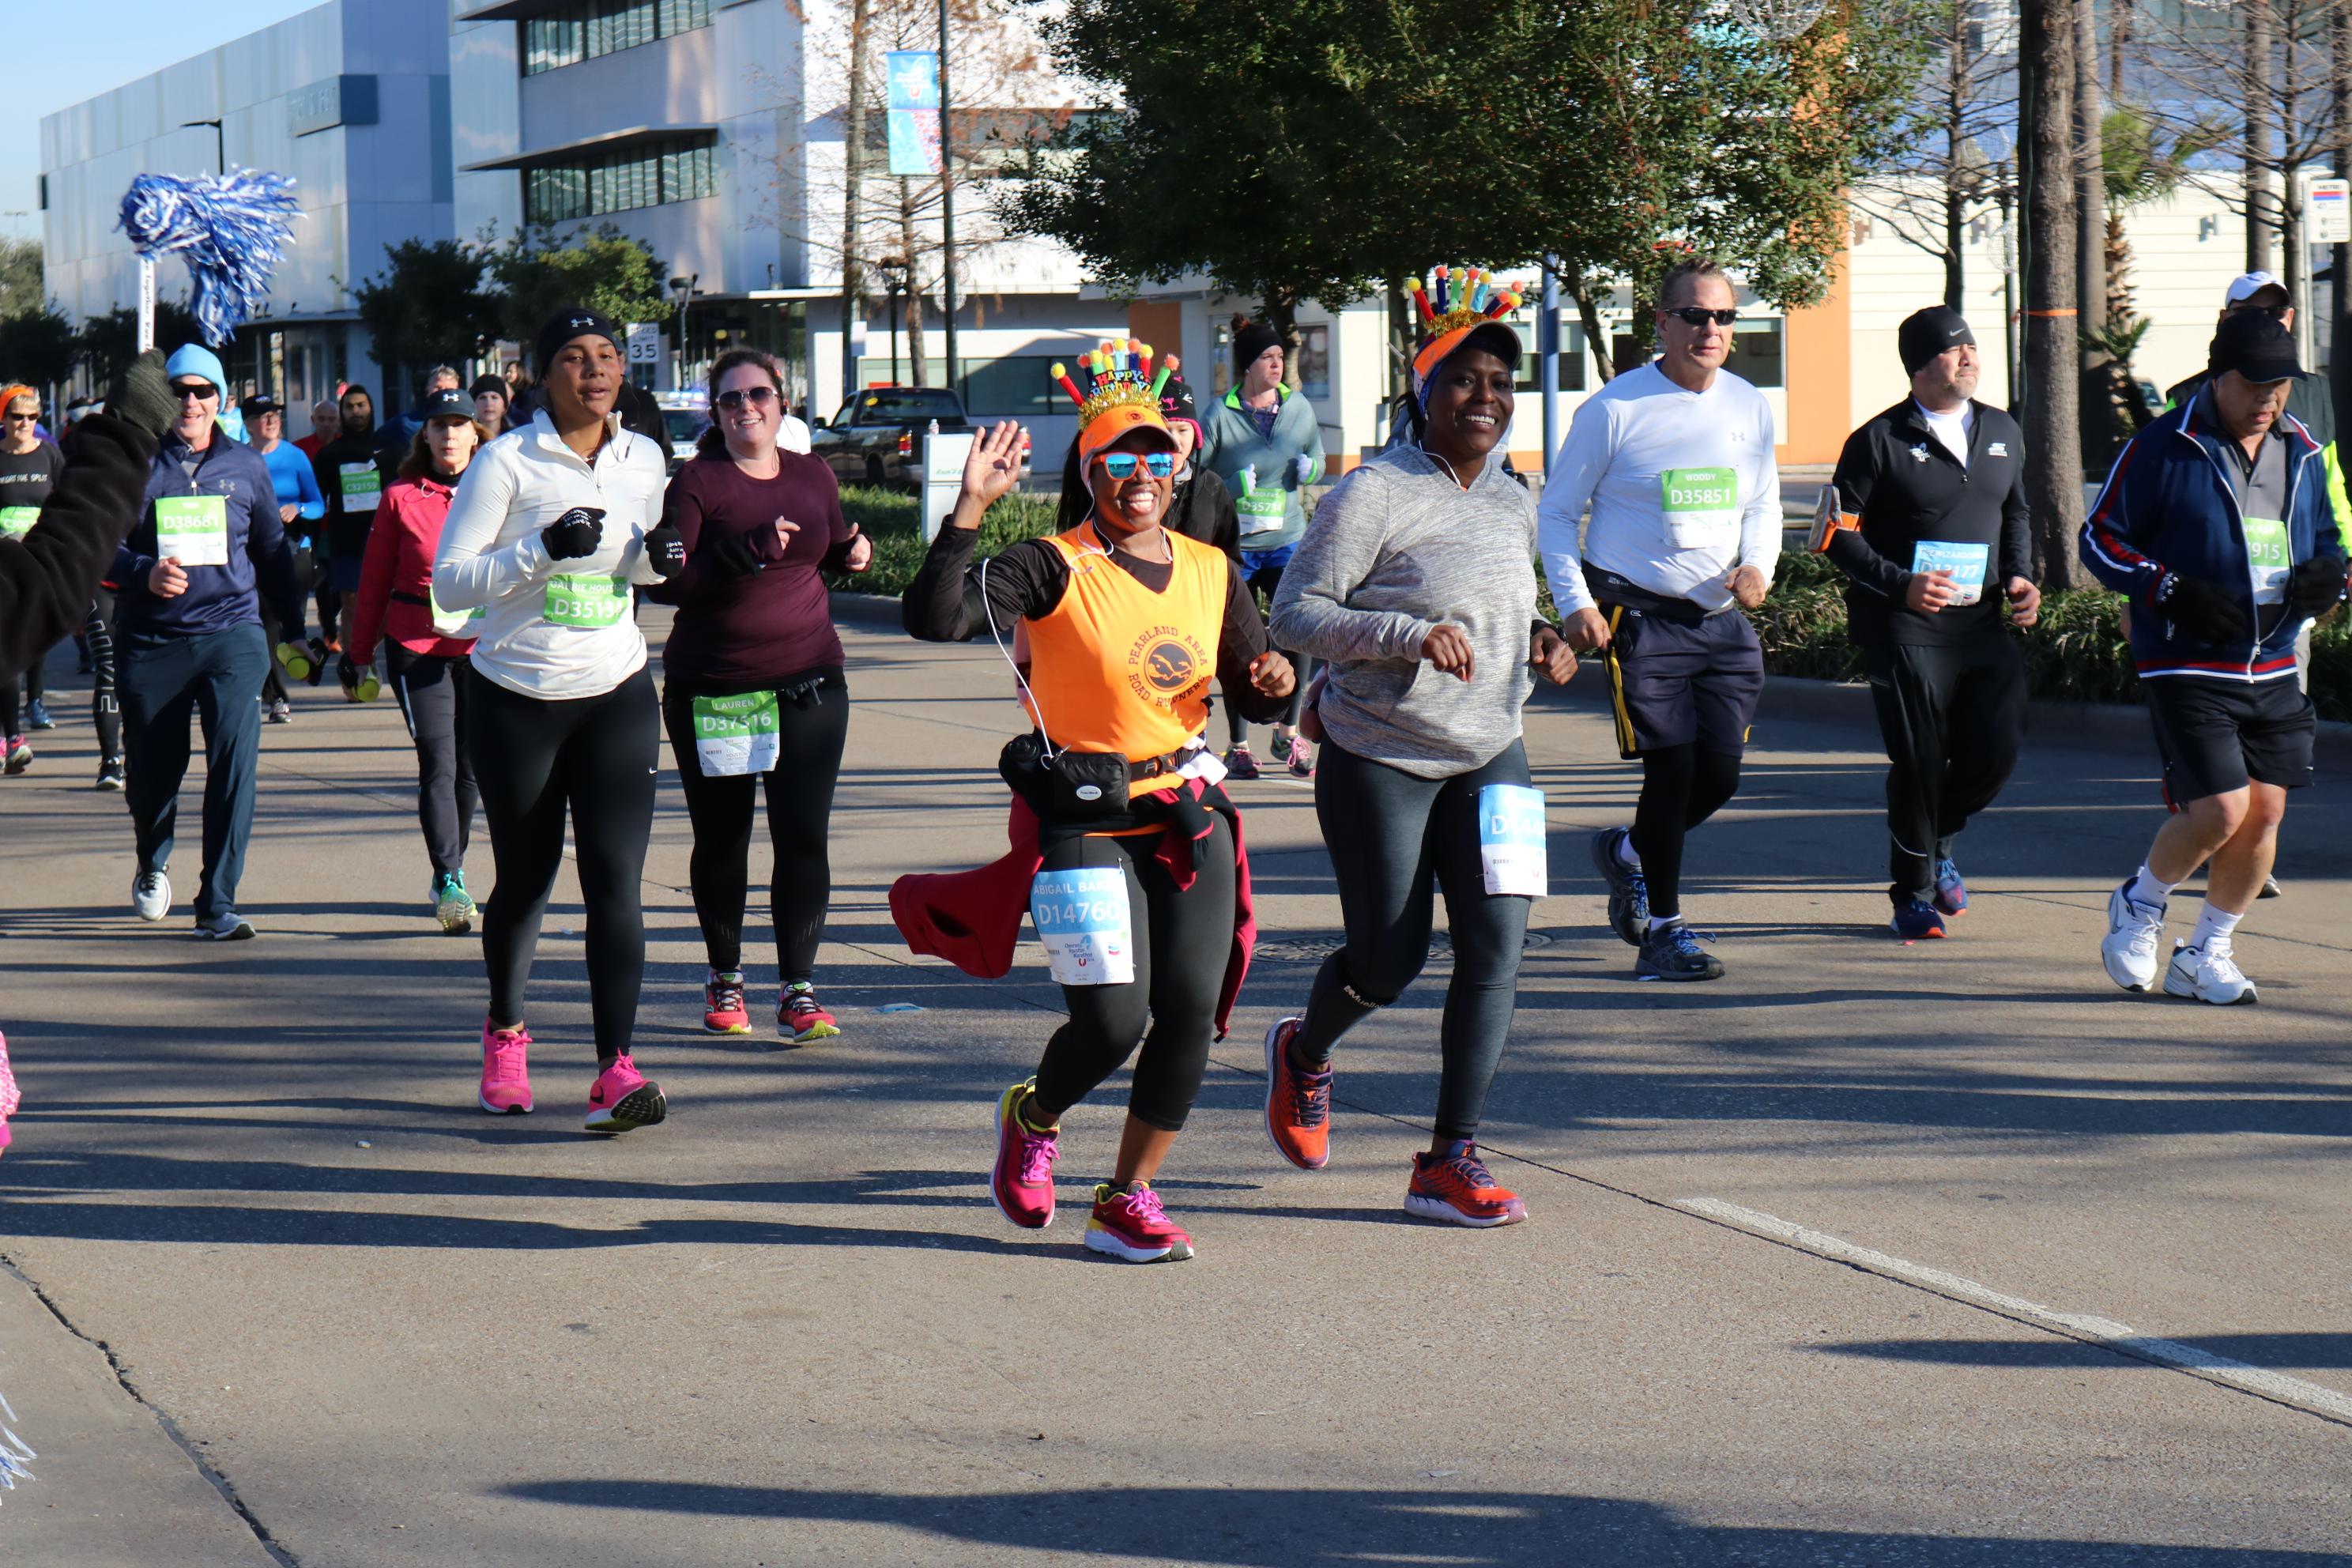 "<div class=""meta image-caption""><div class=""origin-logo origin-image none""><span>none</span></div><span class=""caption-text"">Chevron Houston Marathon and Aramco Half Marathon on Sunday, January 14, 2018</span></div>"